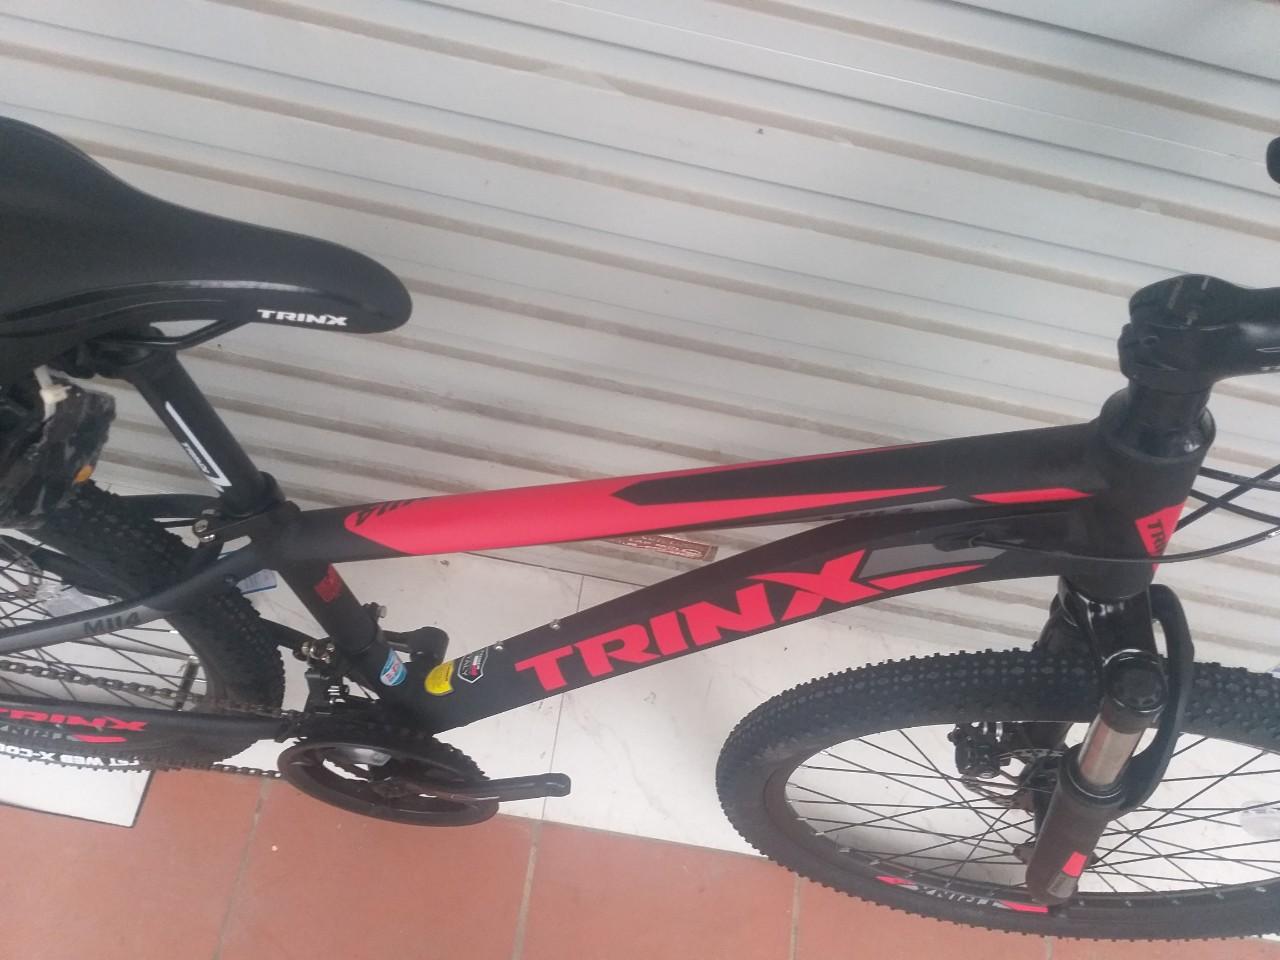 trinx-m114-20219